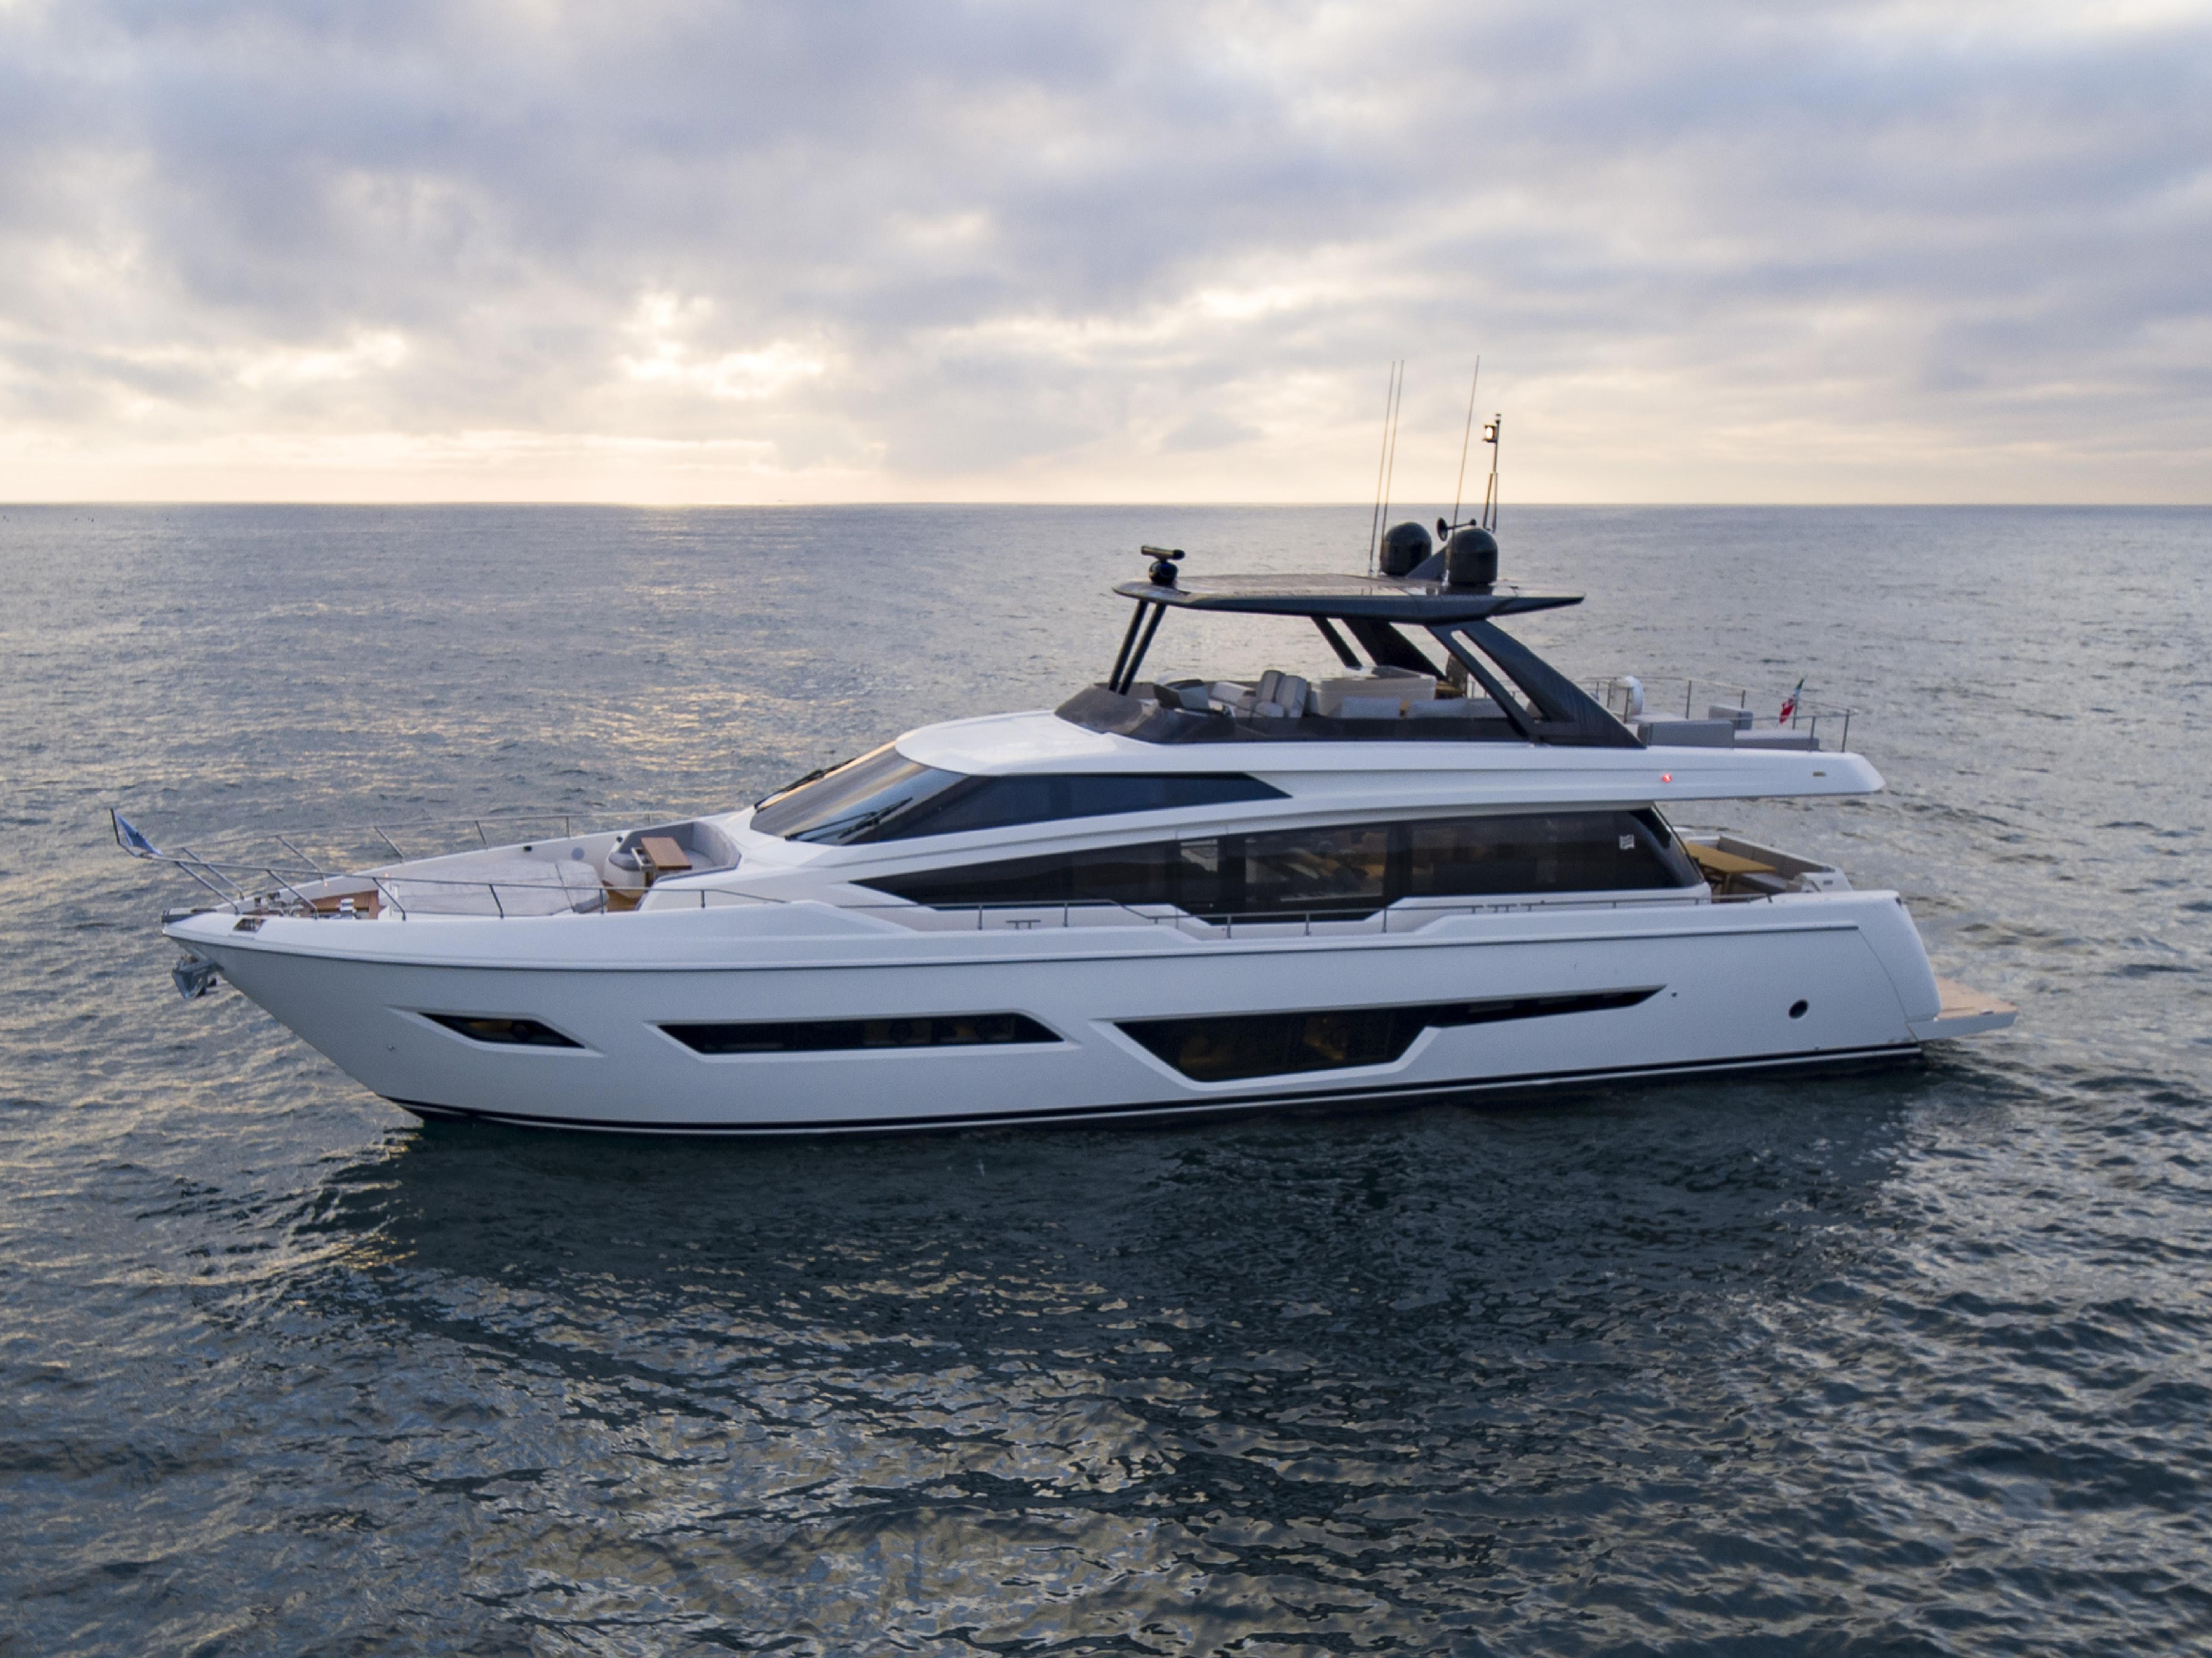 Яхта Ferretti Yachts 780 #38